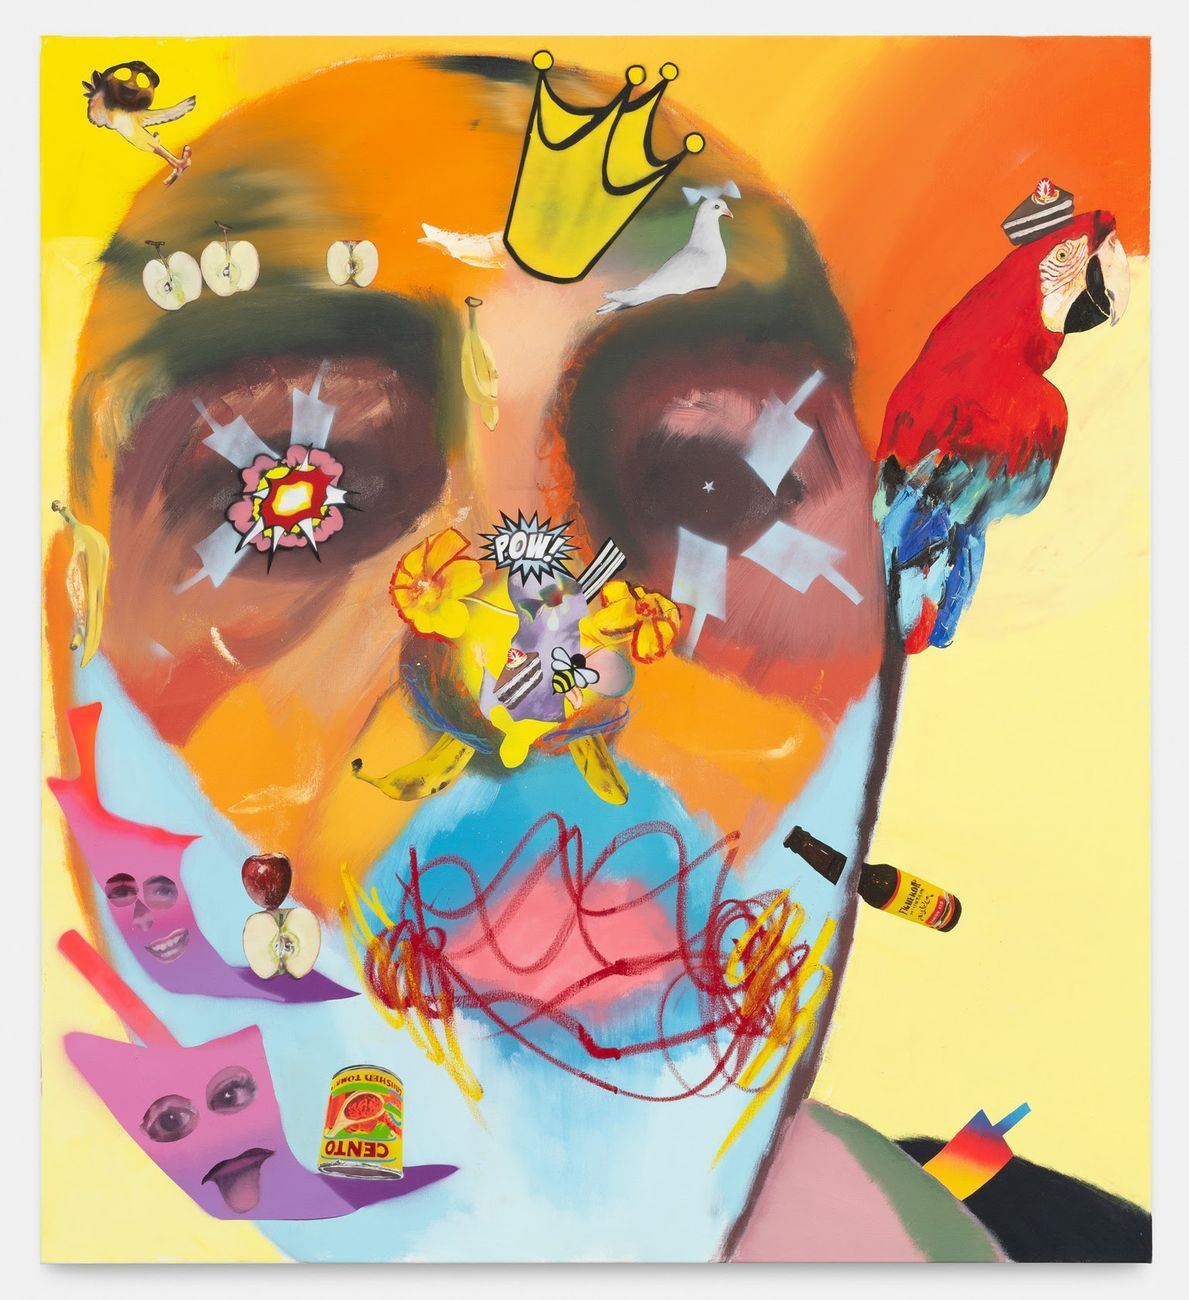 Alessandro Pessoli, Adorned King, 2020, olio, pittura spray e pastelli a olio su tela, 145x160 cm. Courtesy Havier Hufkens Gallery